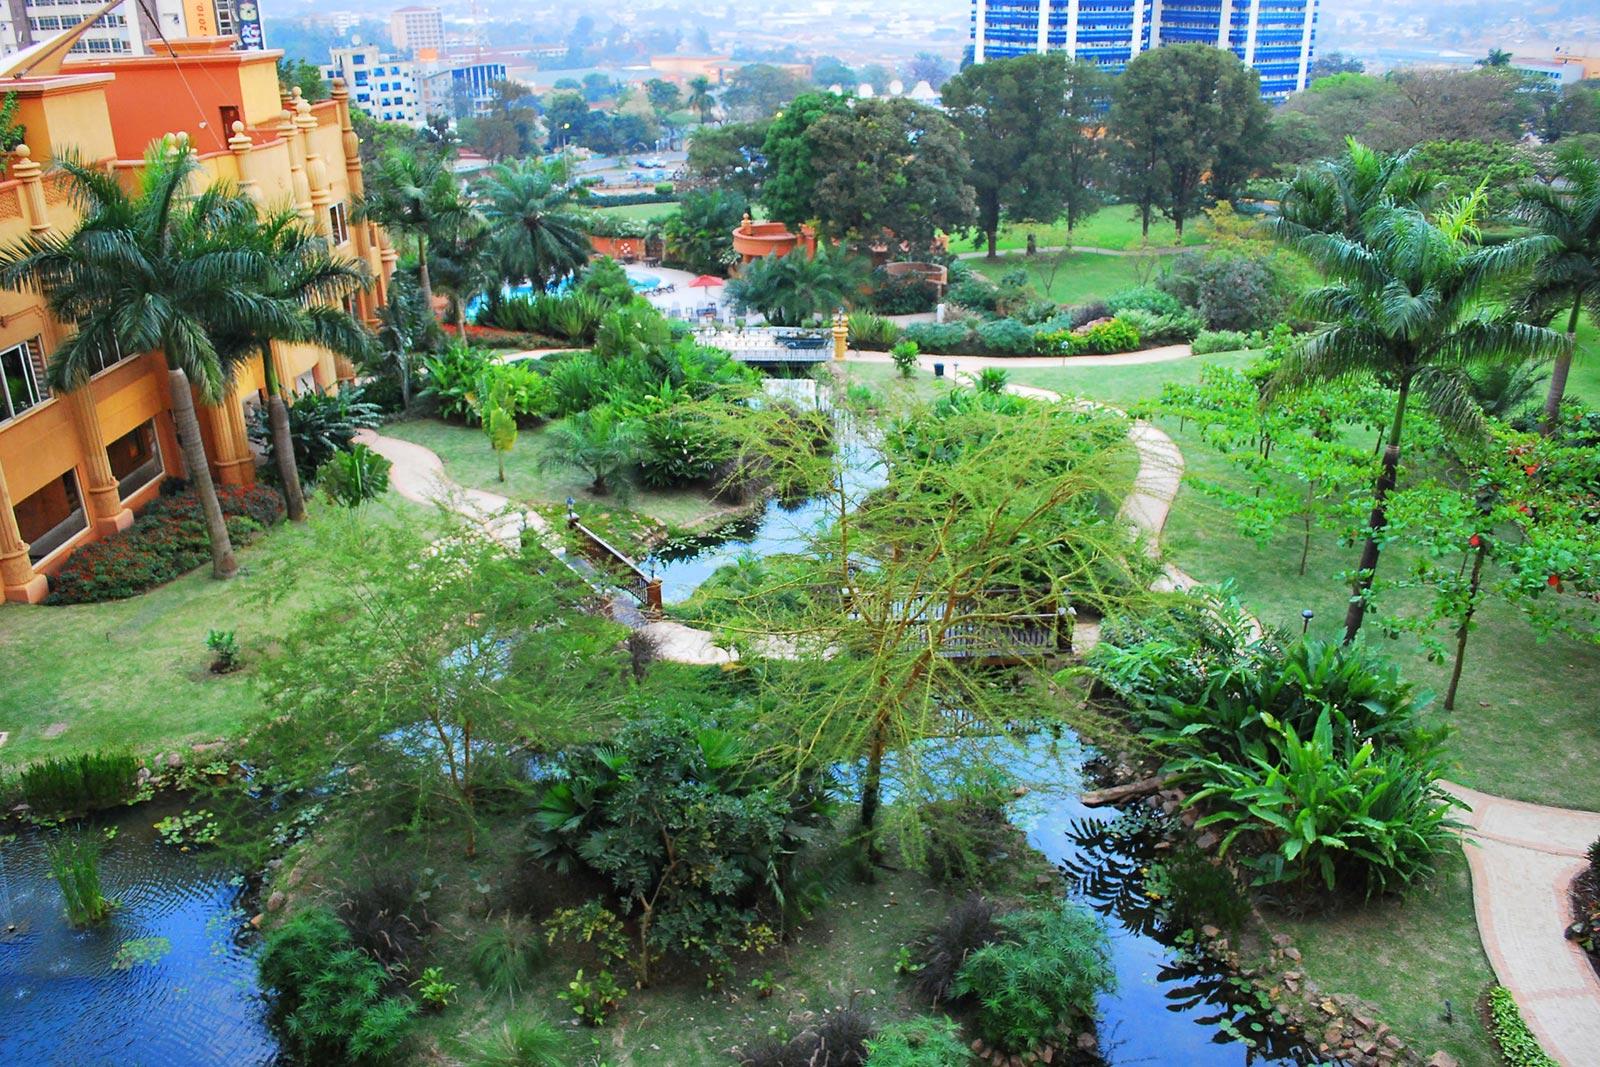 Day 1 — Arrive at Entebbe — Serena Lake Victoria Hotel